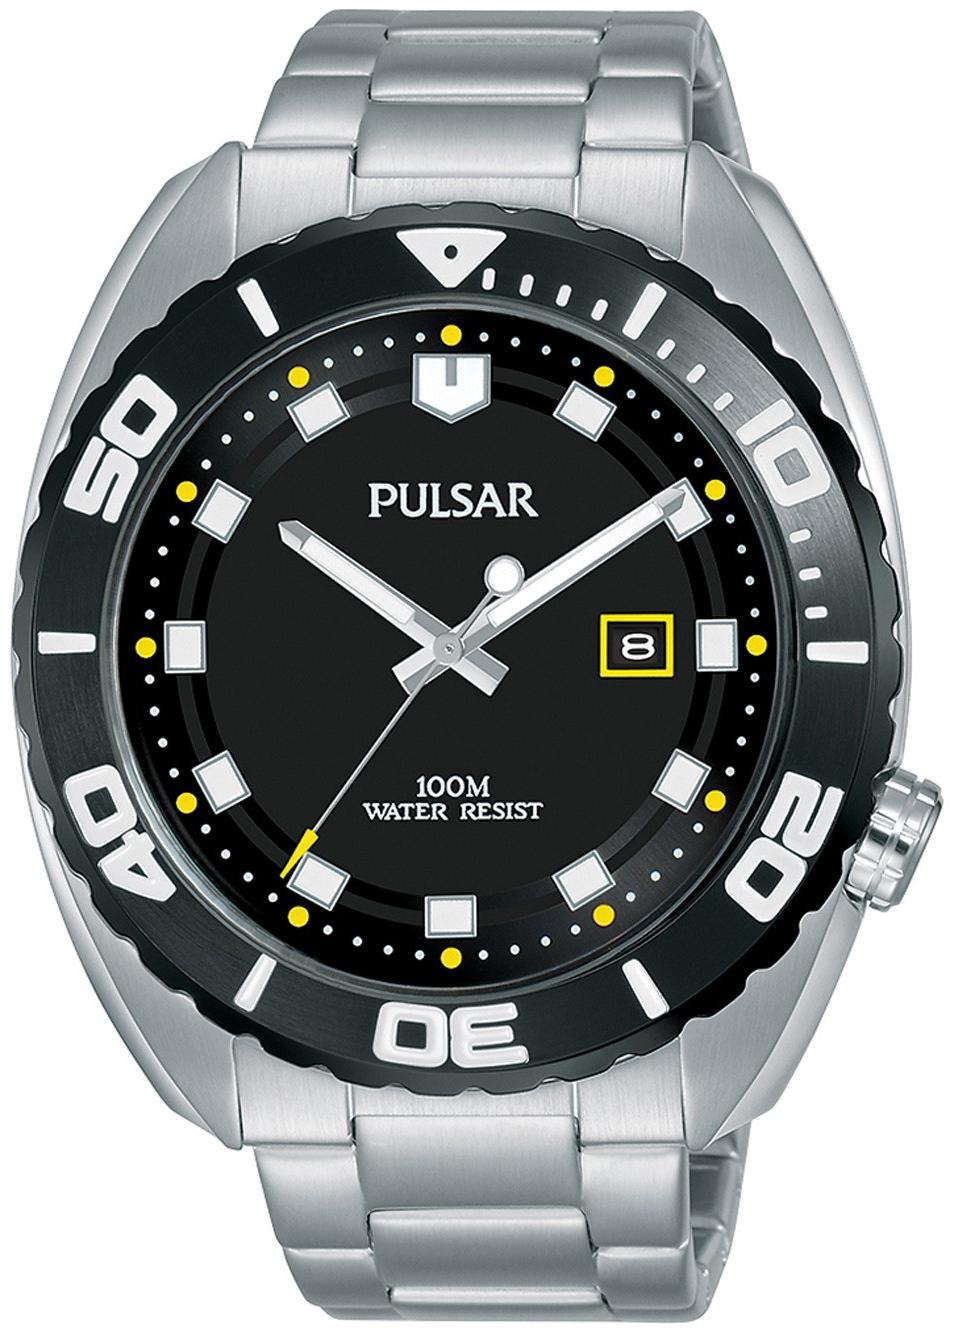 Pulsar Sport Herreklokke PG8283X1 Sort/Stål Ø45 mm - Pulsar